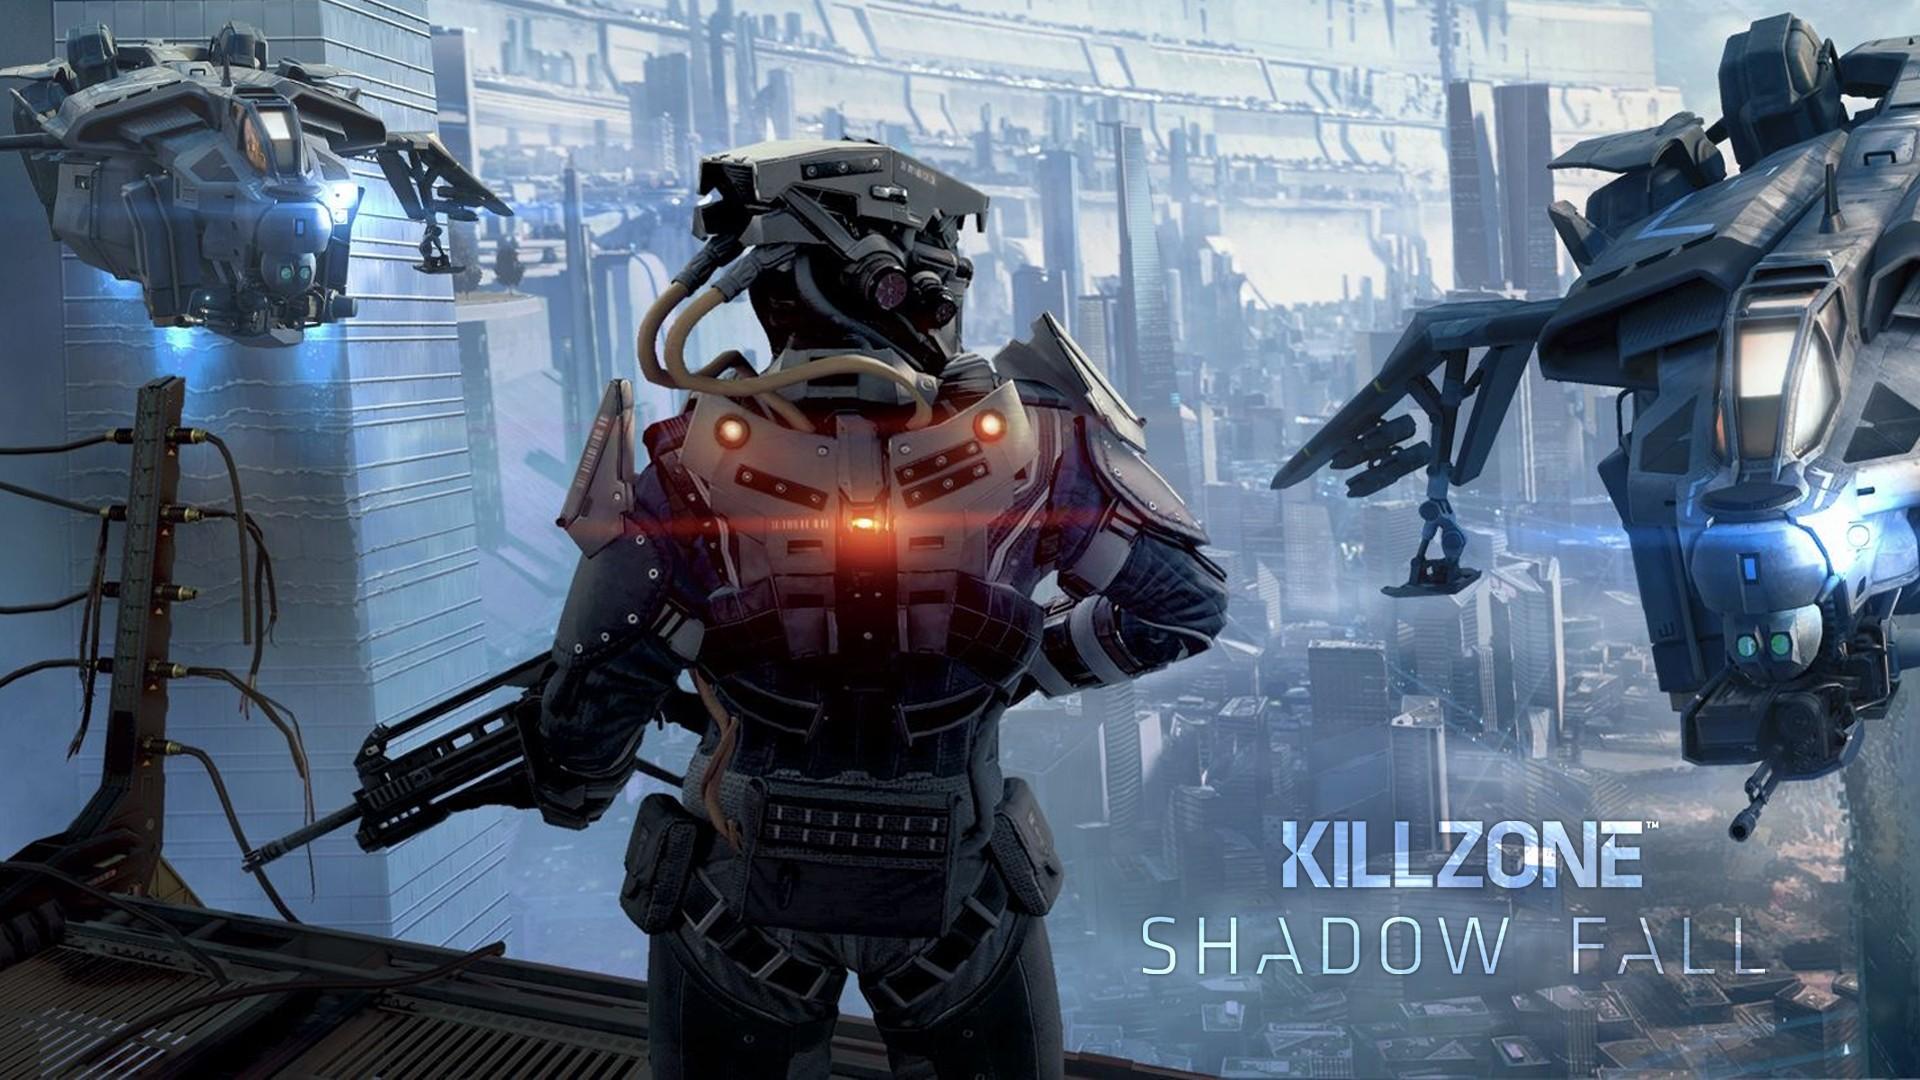 Killzone Shadow Fall Background